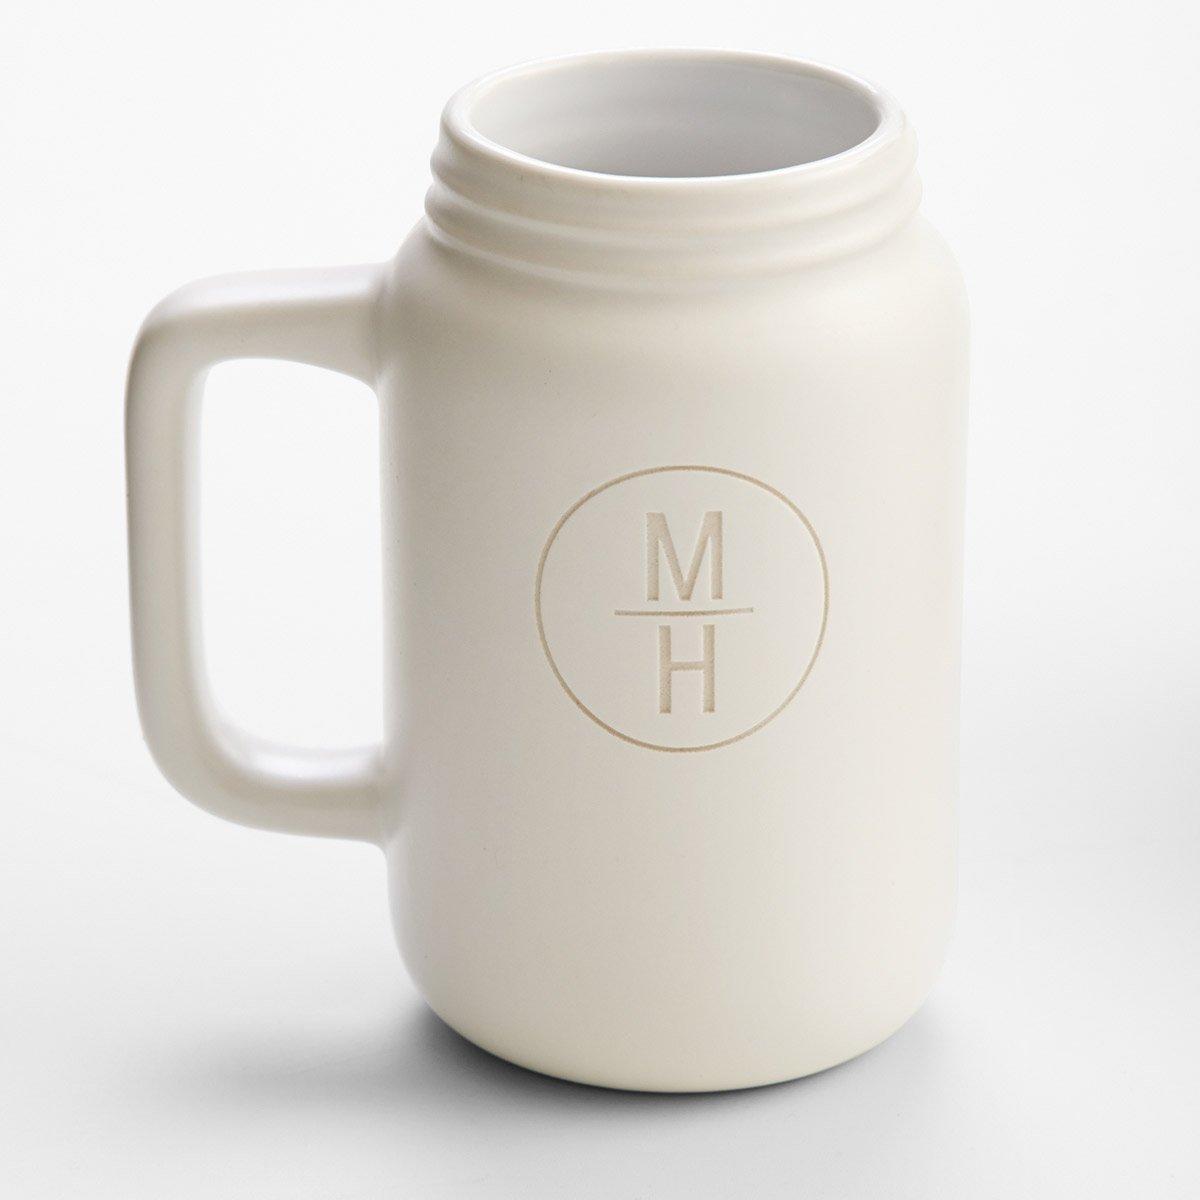 Ceramic Mason Jar Mugs - The Green Head